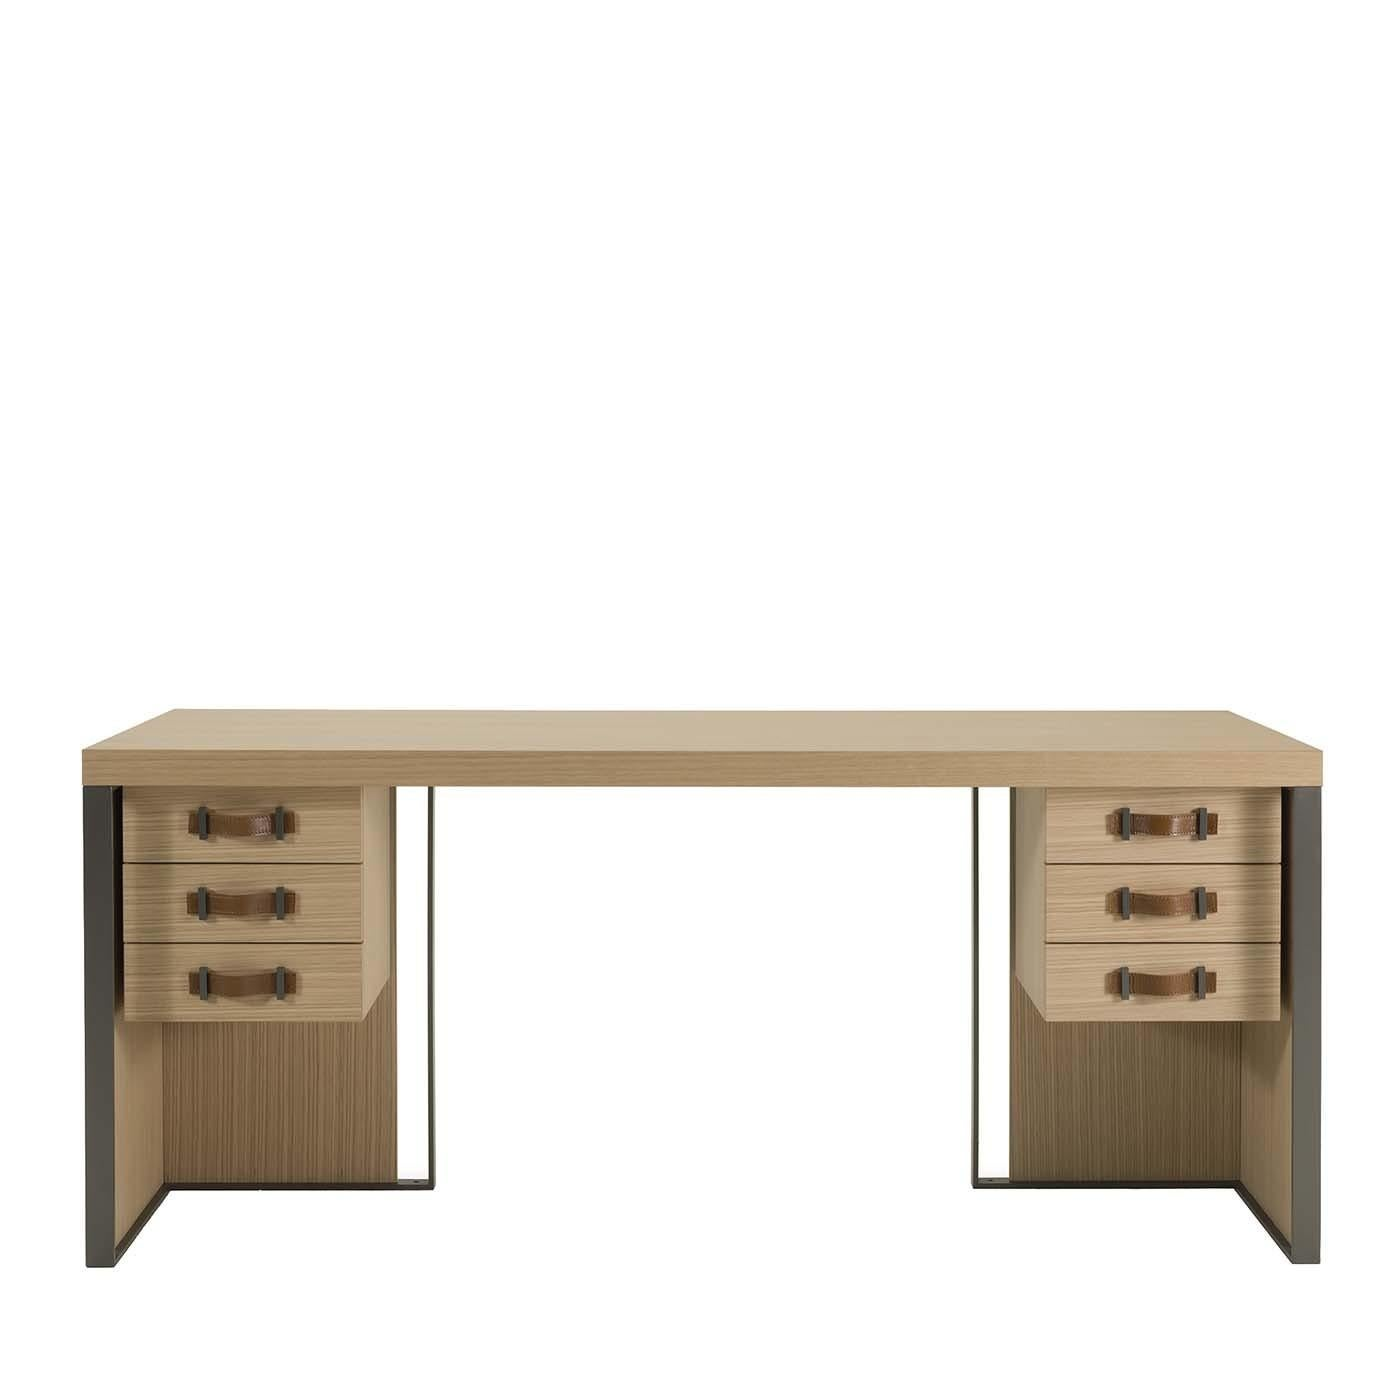 Kobe Durmast Desk with Drawers